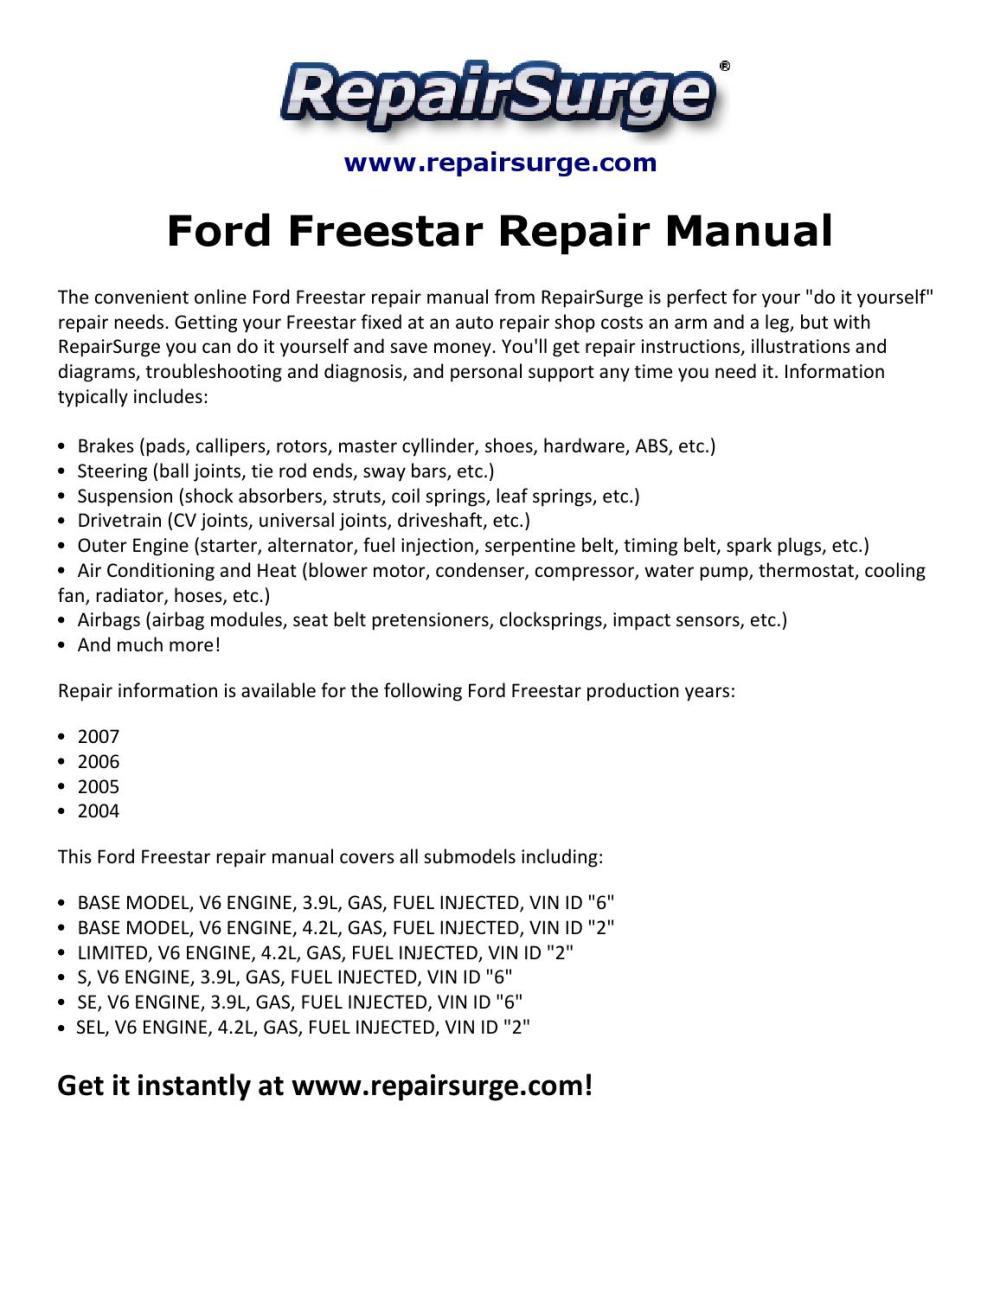 medium resolution of ford freestar repair manual 2004 2007 by macy thomas168 issuu